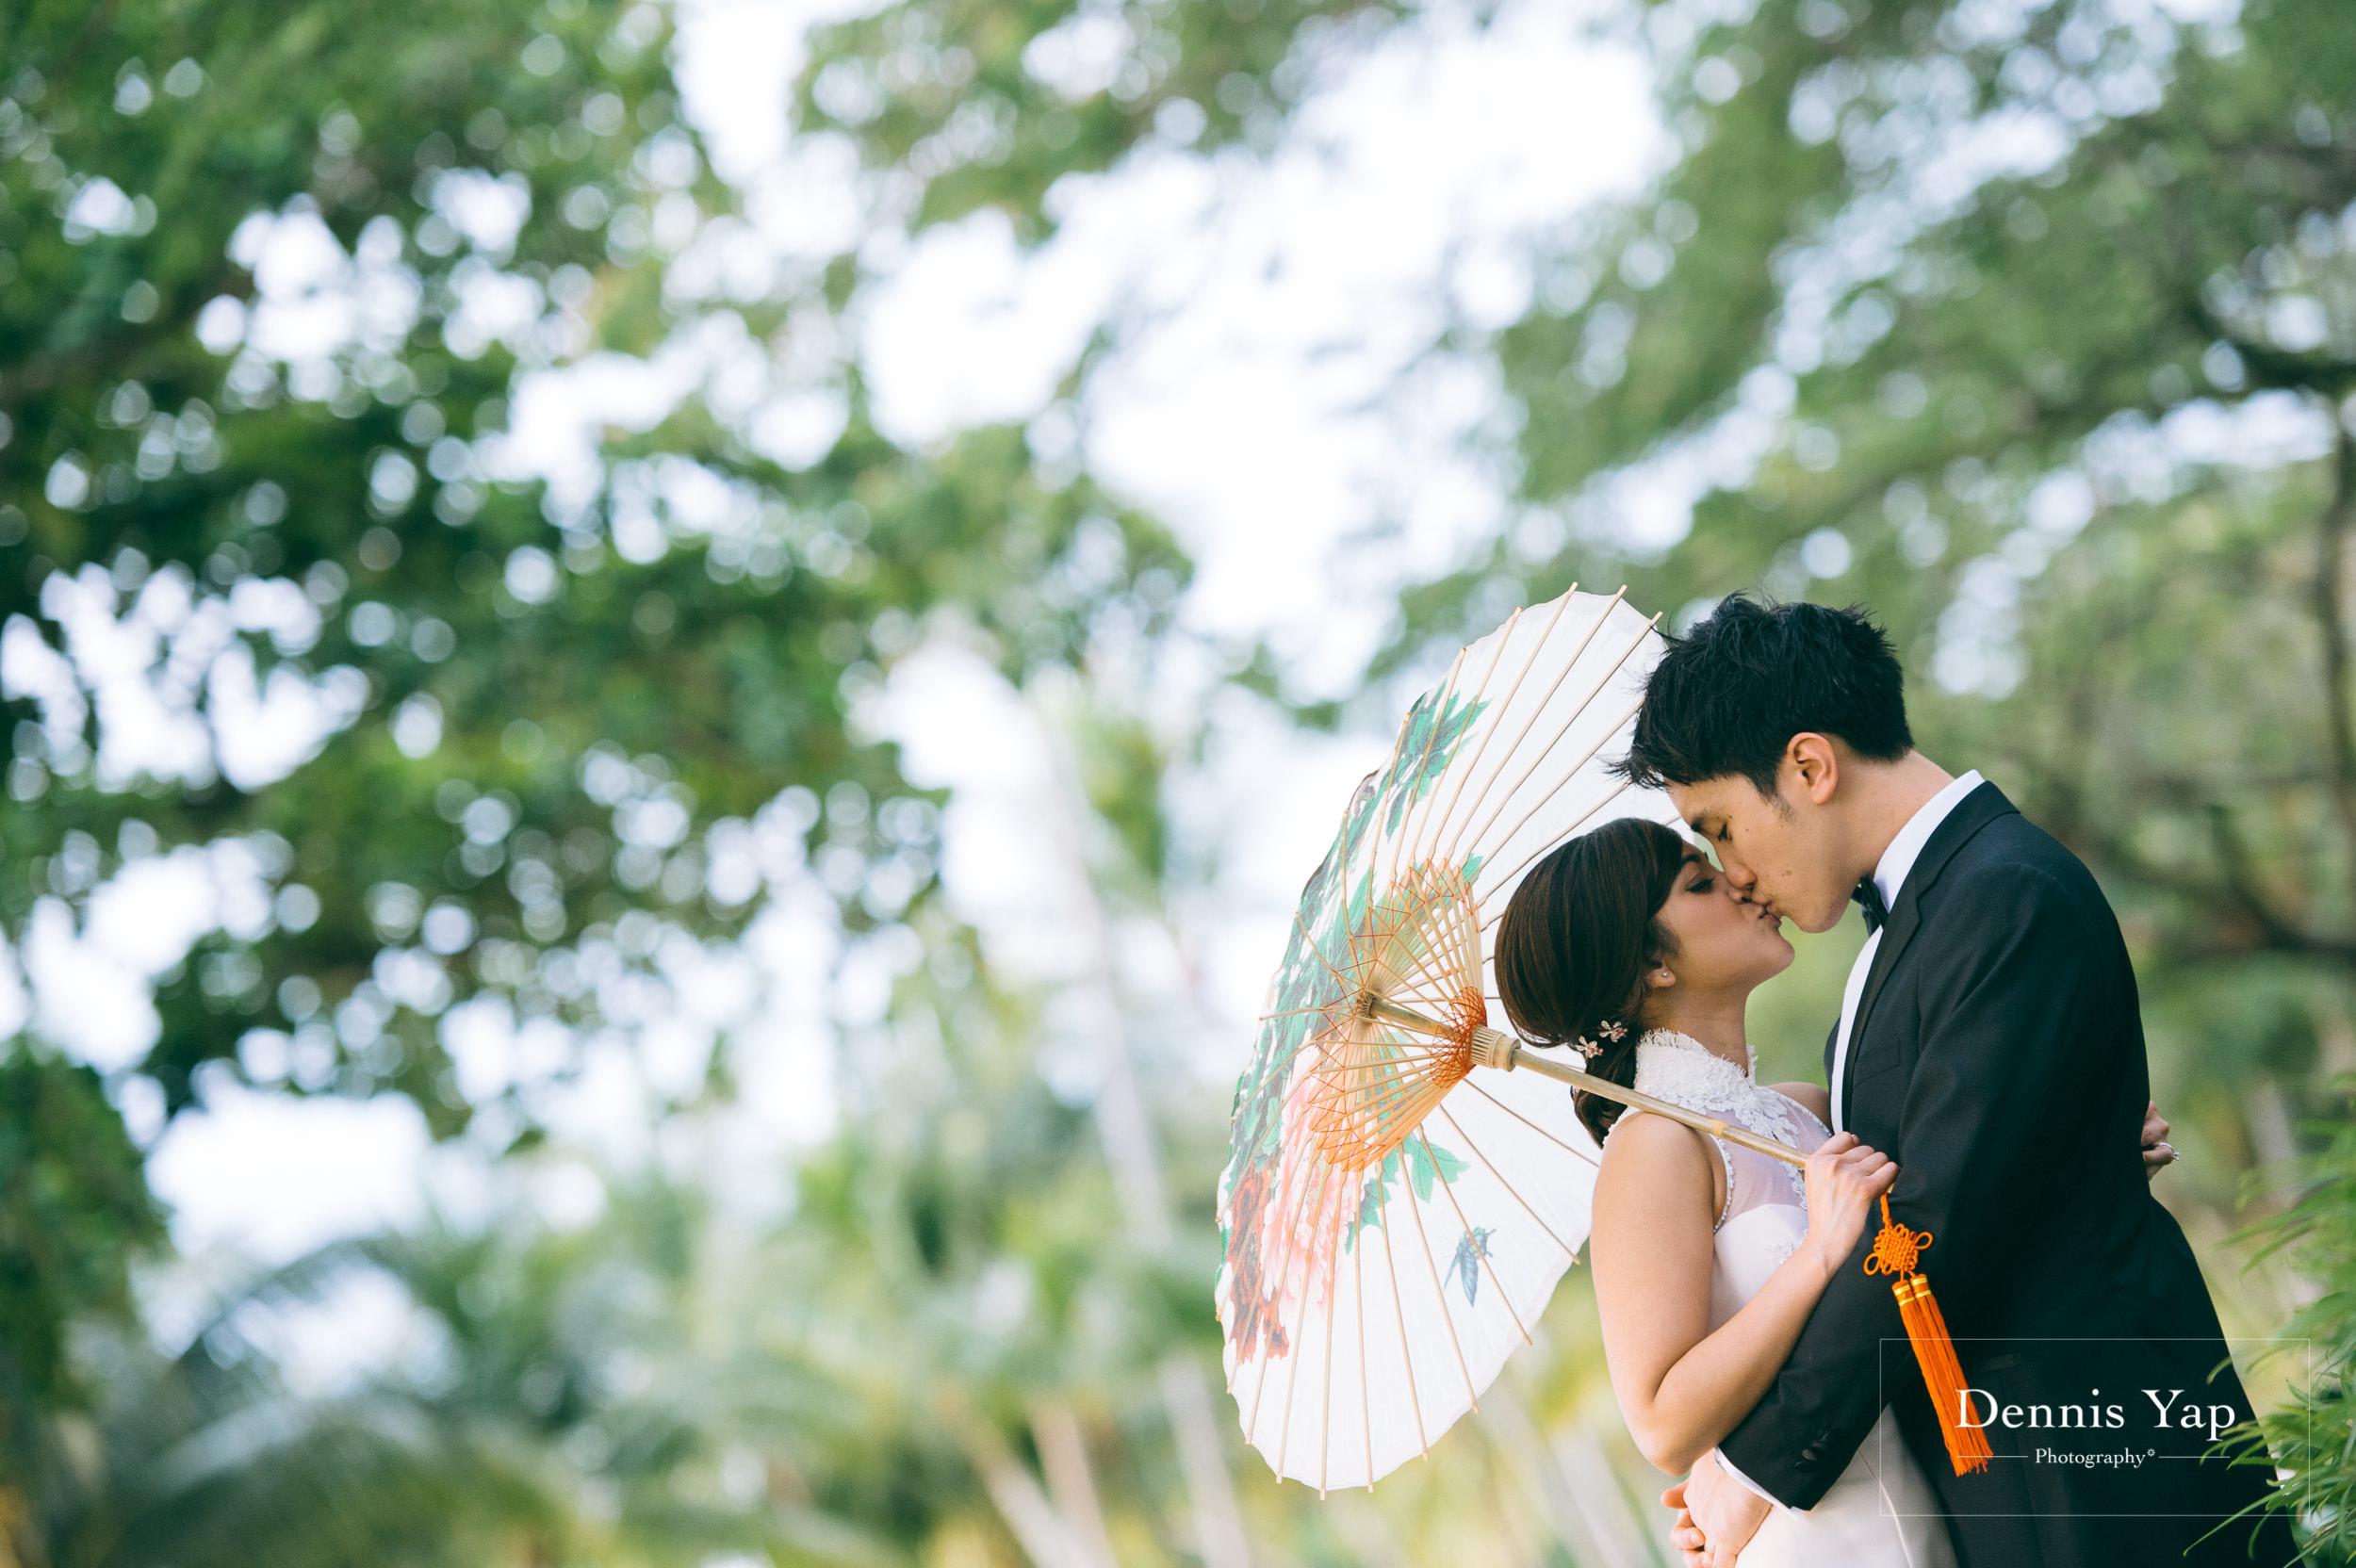 shalini yelitte wedding dinner rasa sayang resort penang dennis yap photography malaysia top wedding photographer beloved emotions flow -16.jpg